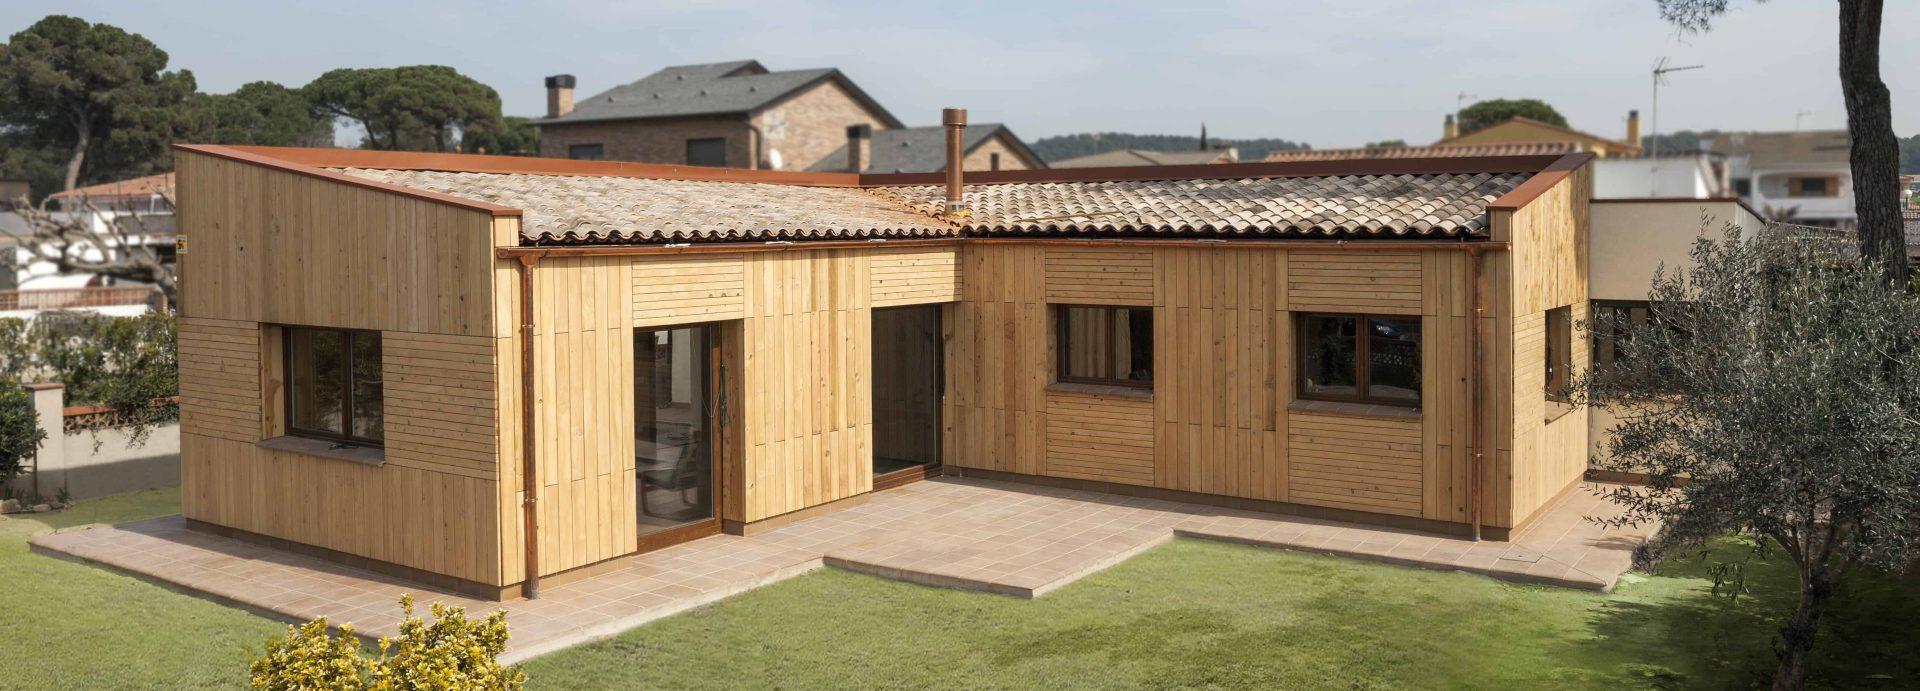 segunda casa passivhaus en cataluña